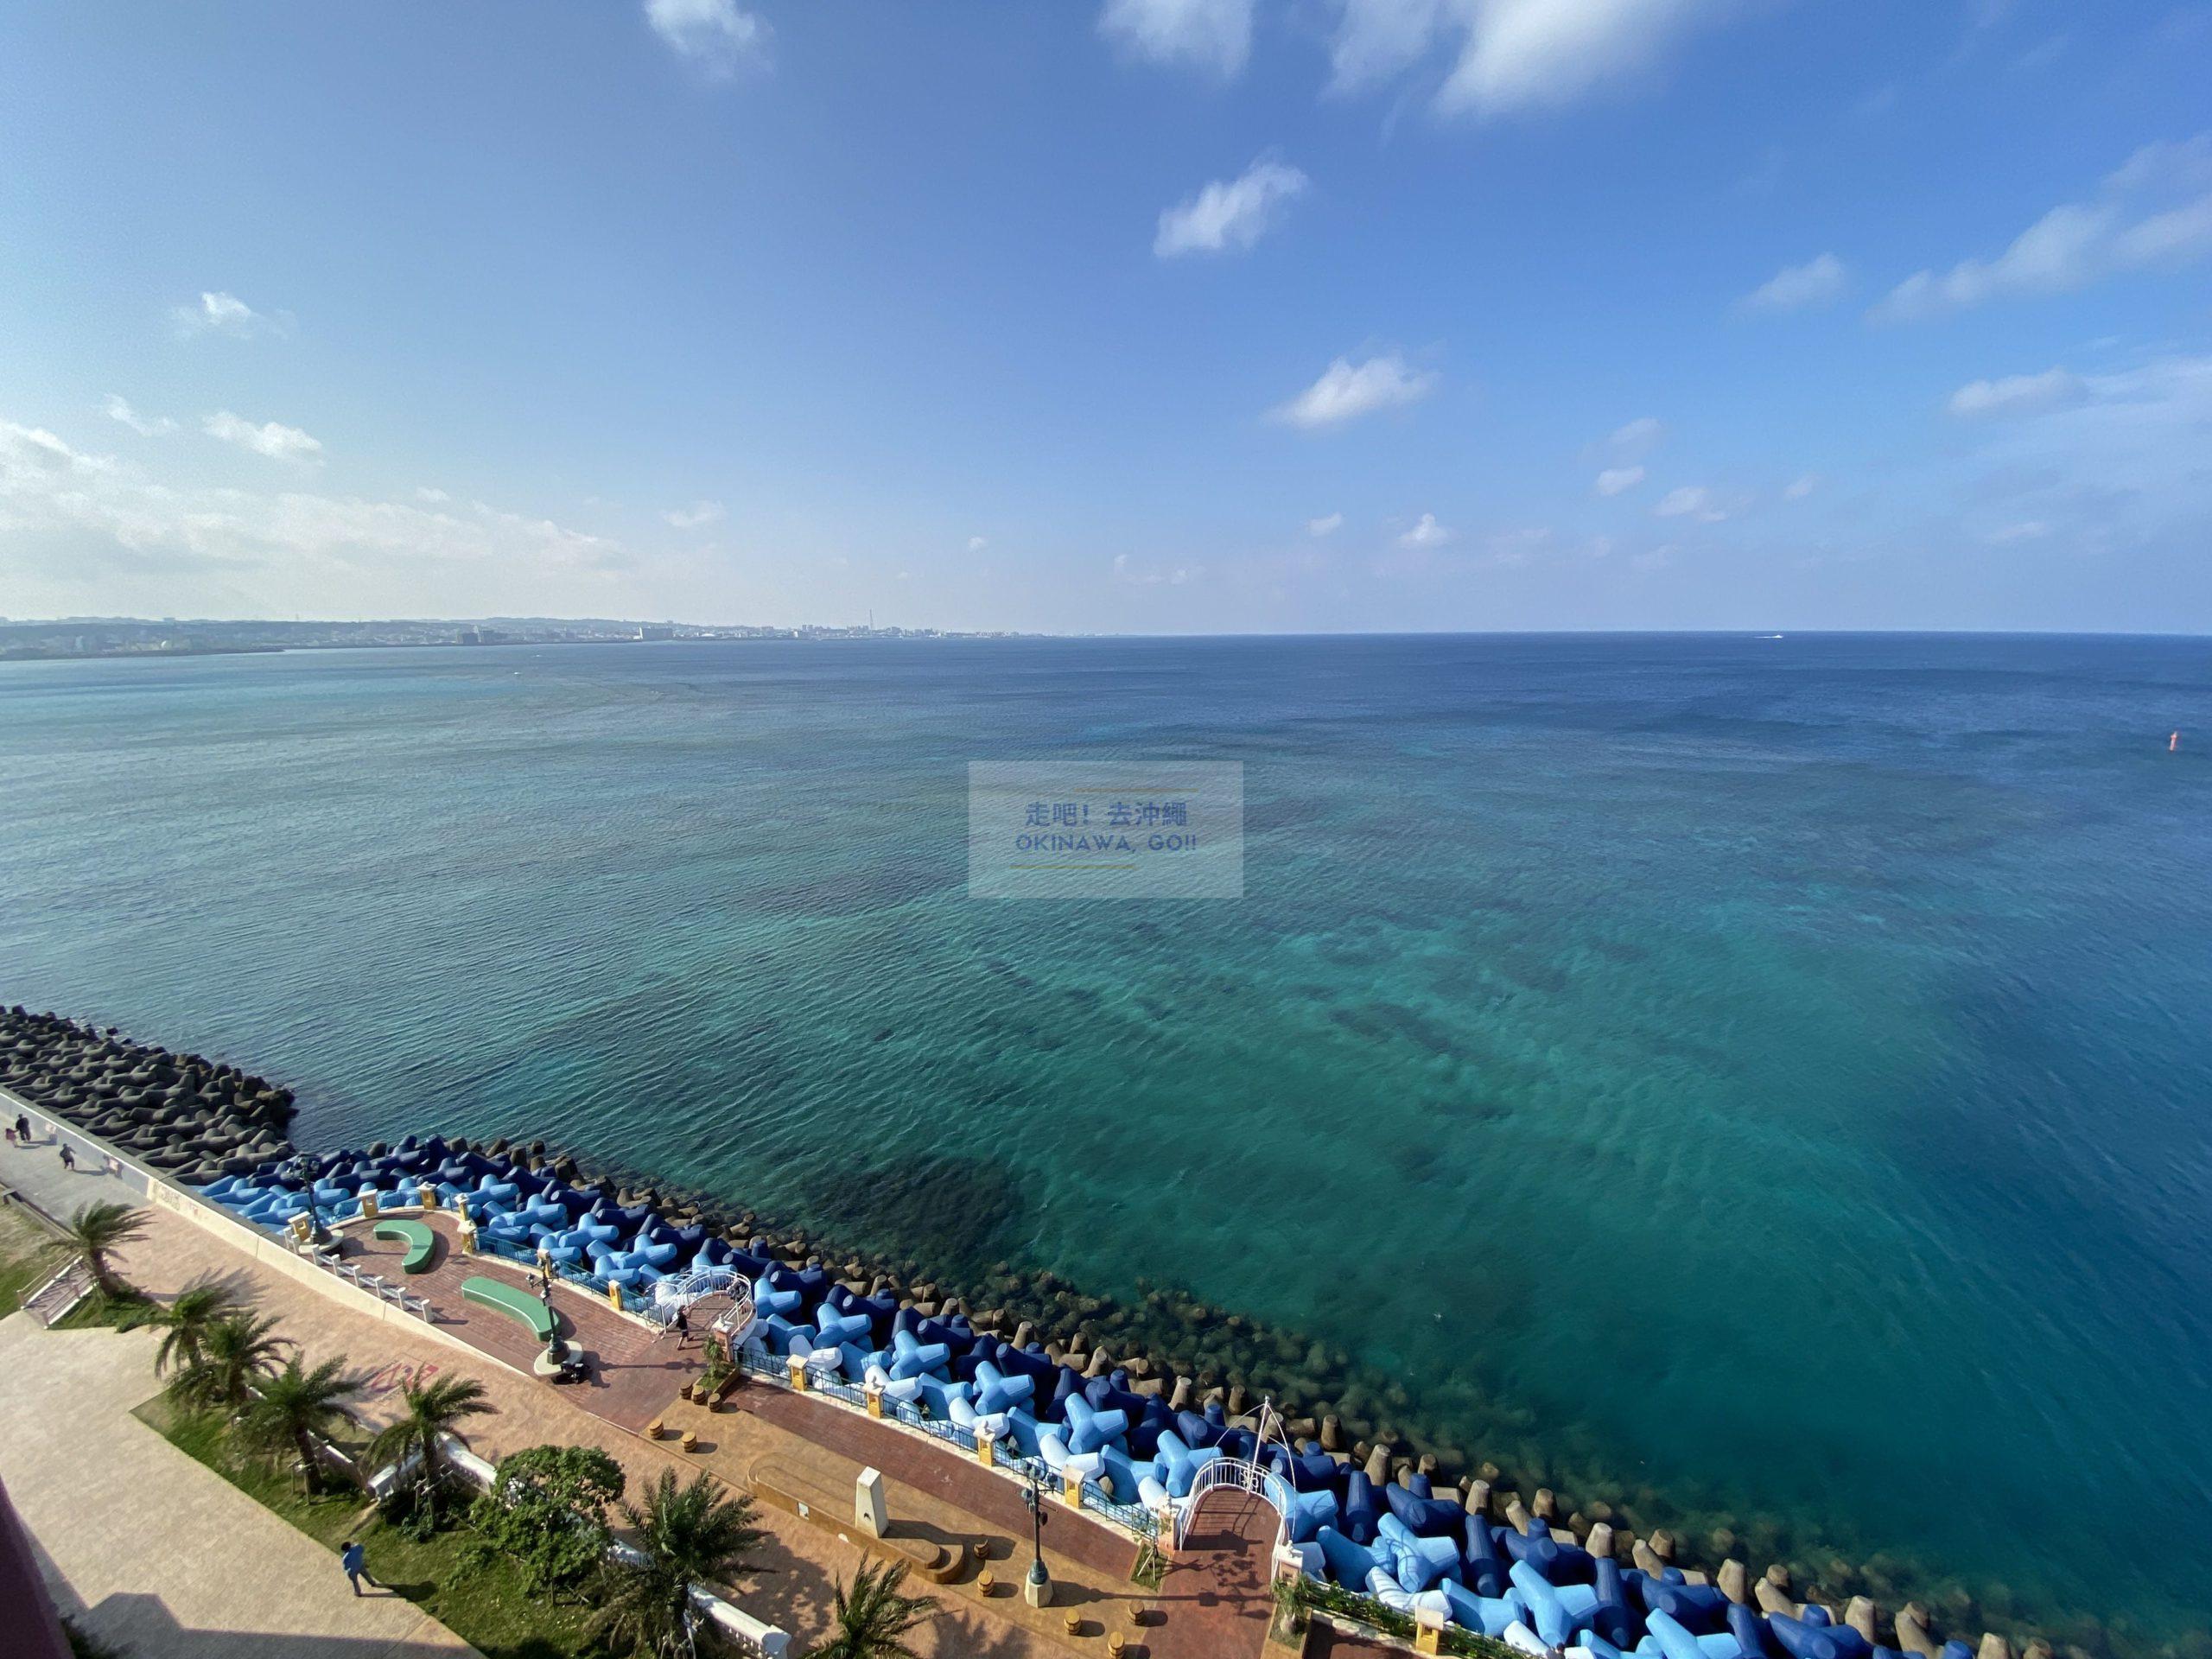 Vessel Hotel Campana Okinawa飯店開箱評價-無敵海景